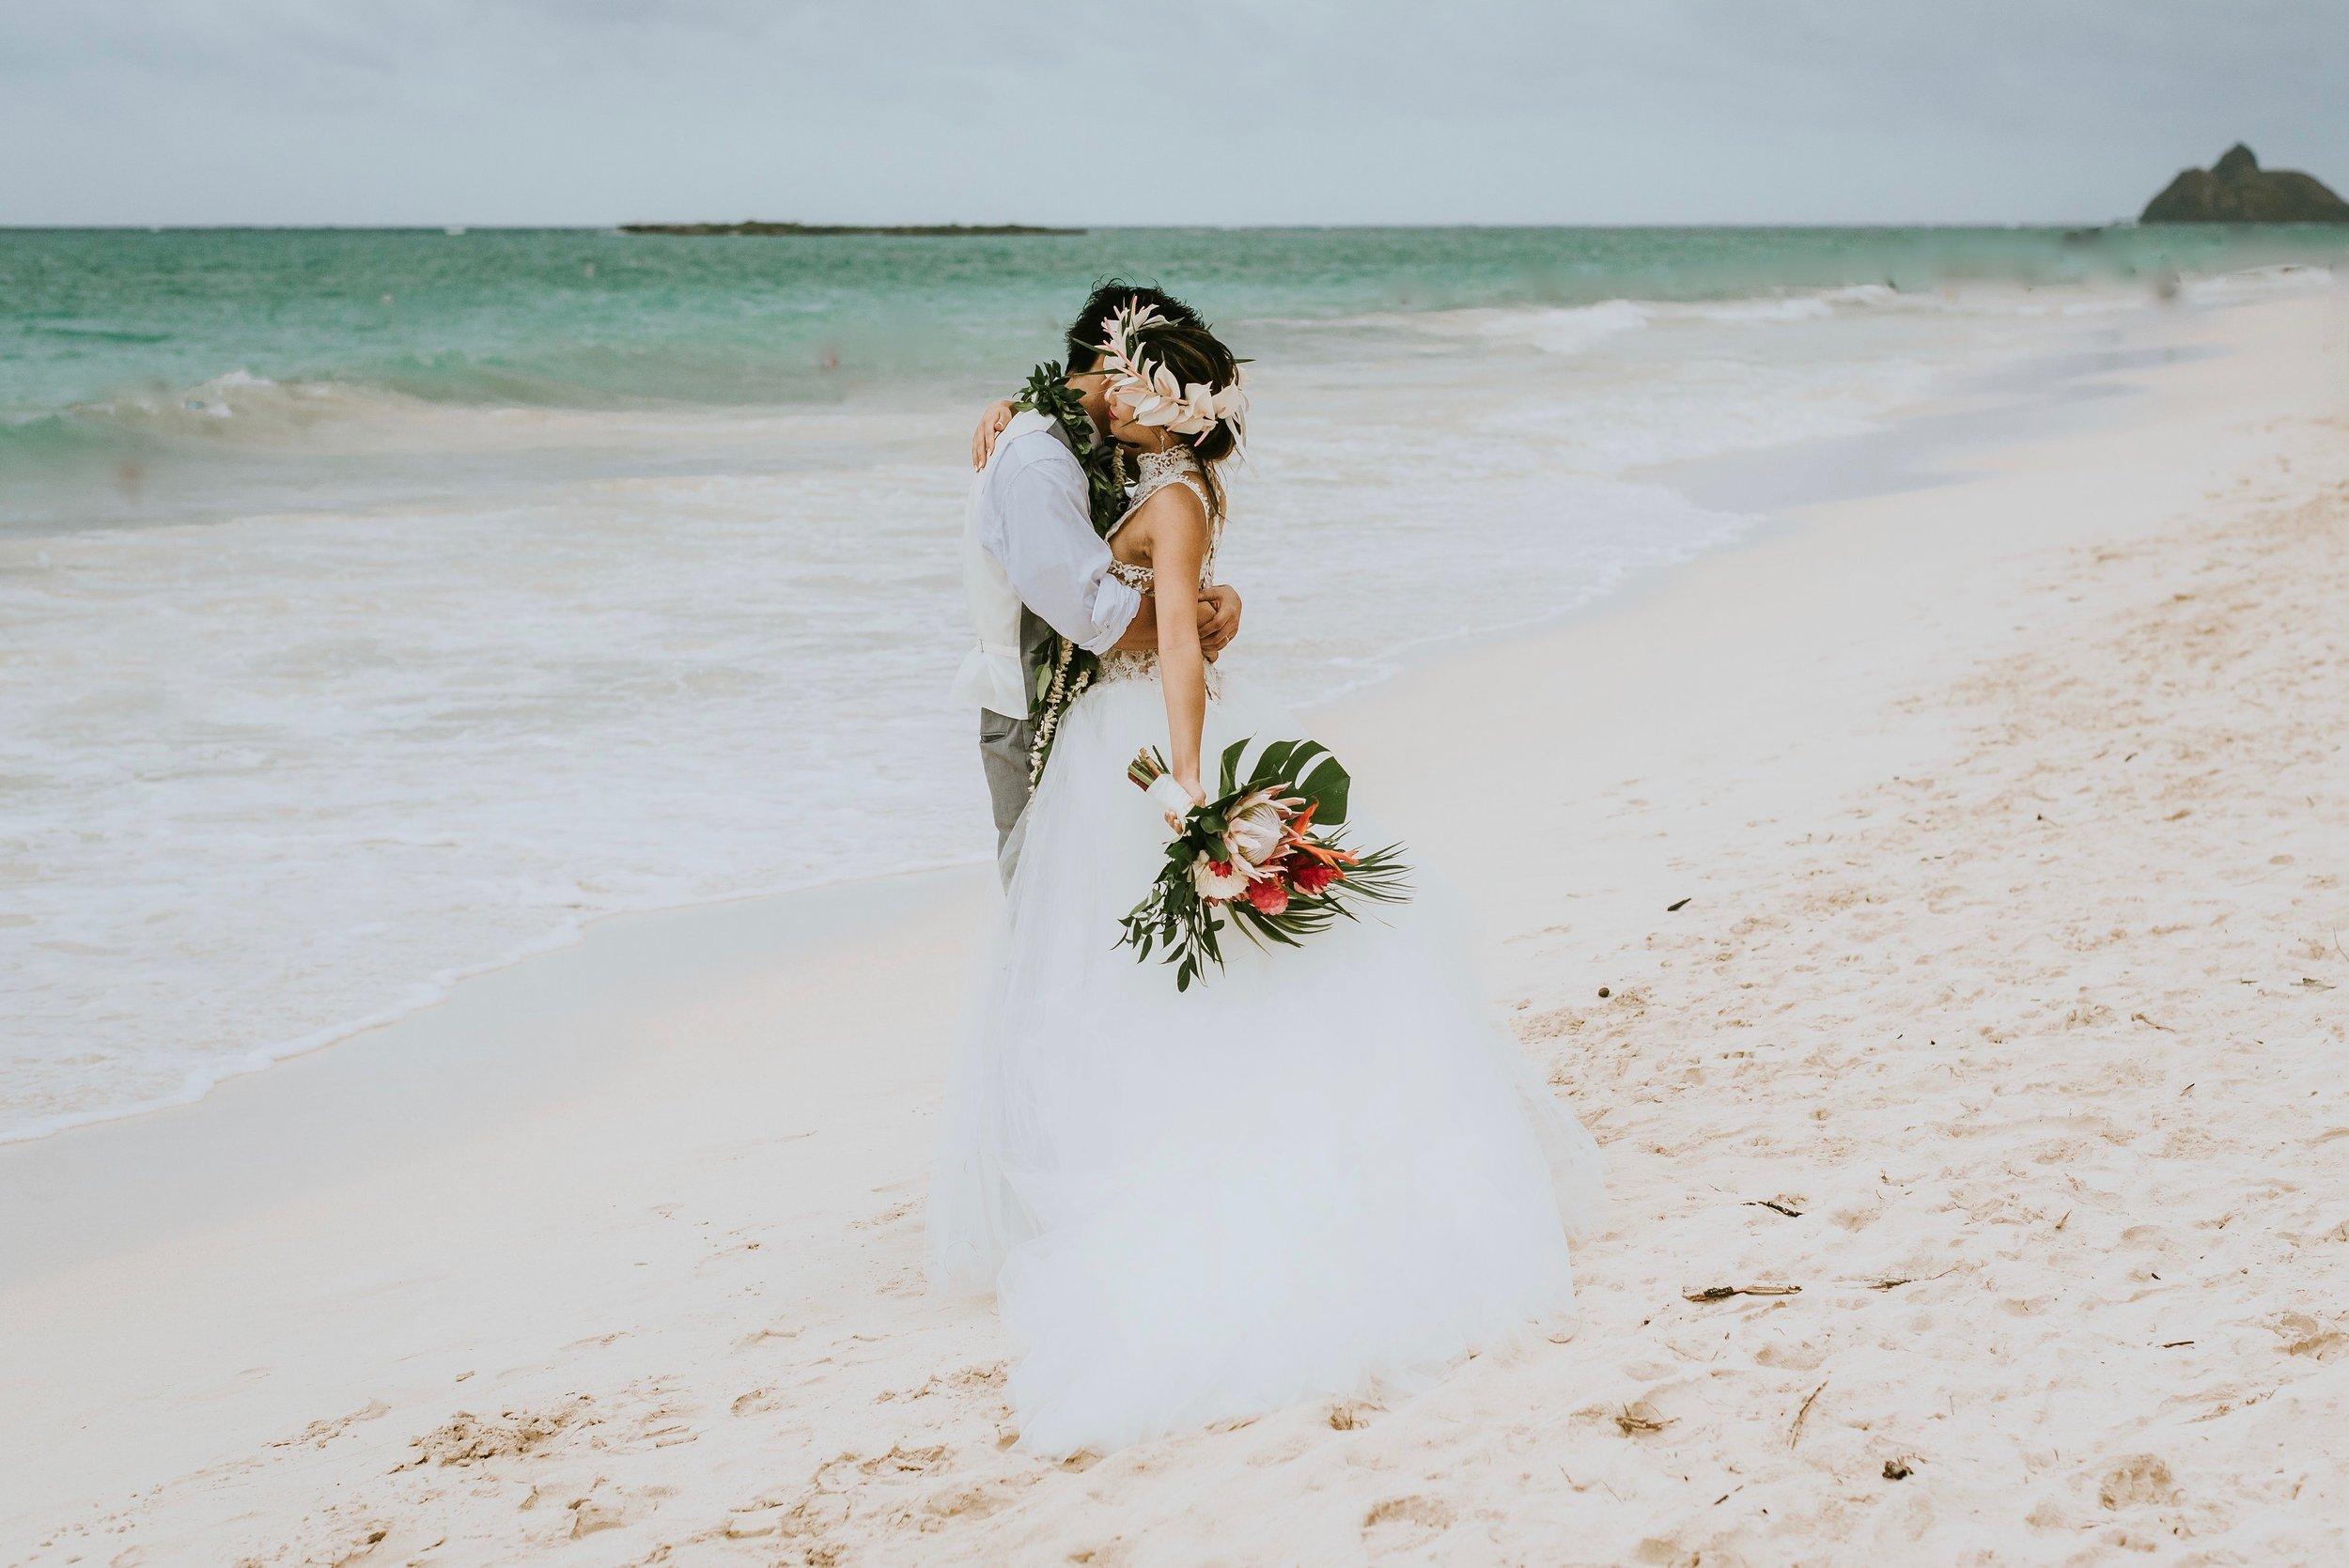 Bride&GroomBeachKei&Kentaro-usedGoogle.jpg